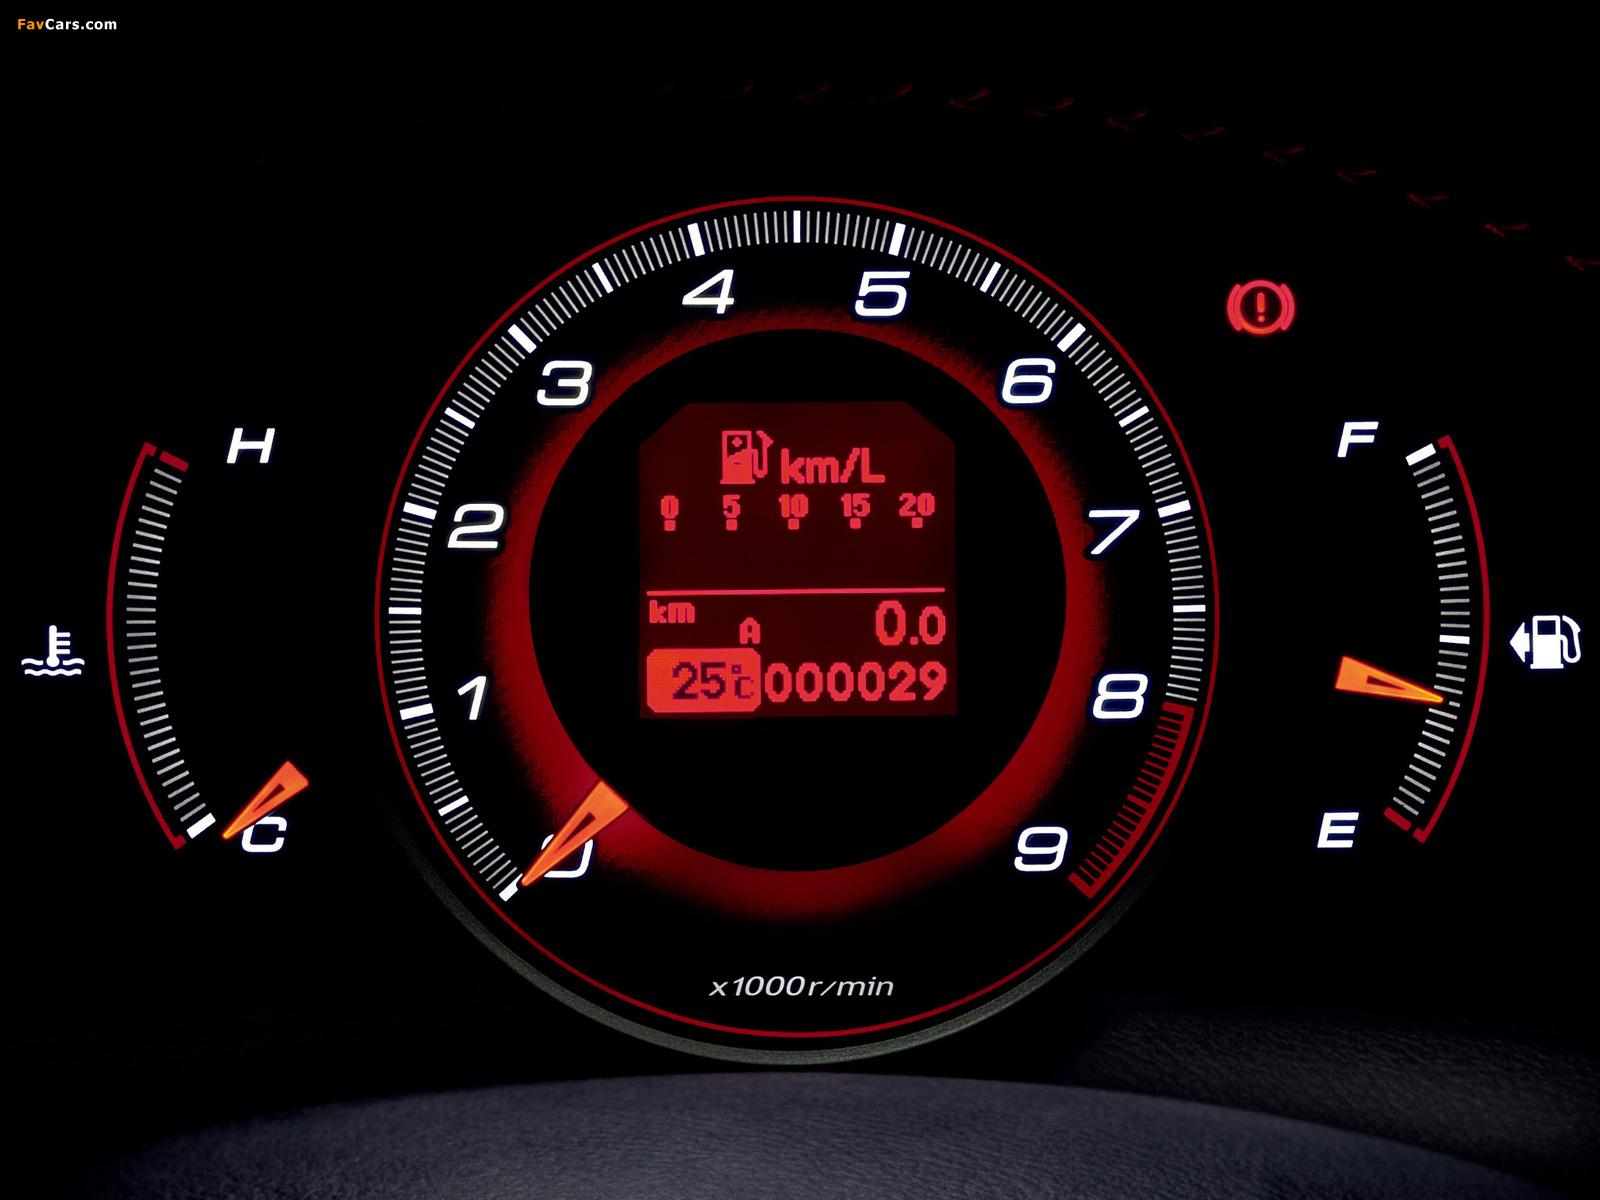 Car Dashboard Wallpaper Honda Civic Type R Euro Fn2 2009 Wallpapers 1600x1200